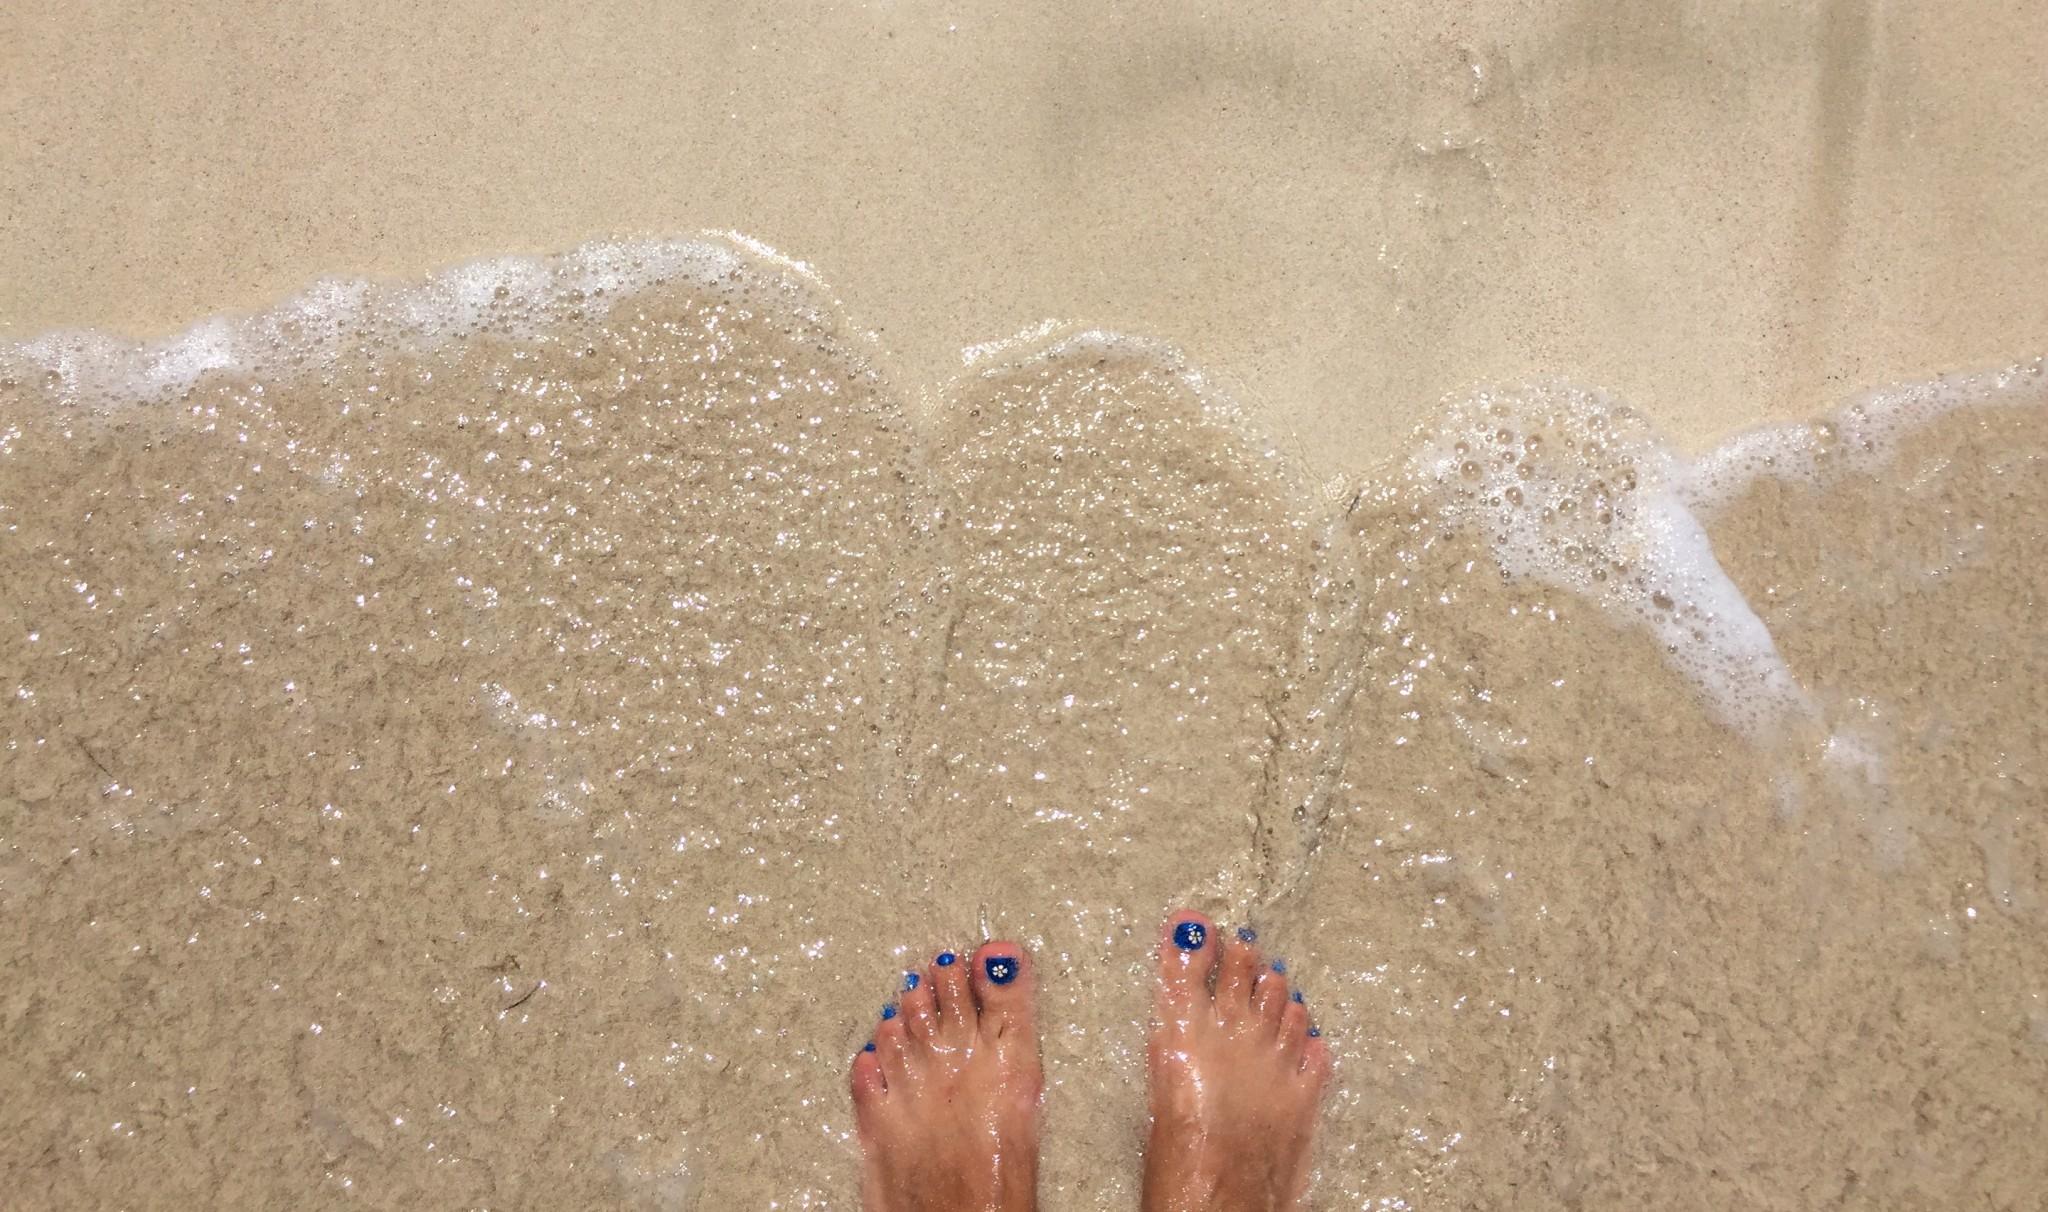 Strand-Füsse-im-Wasser-bk-IMG_2013